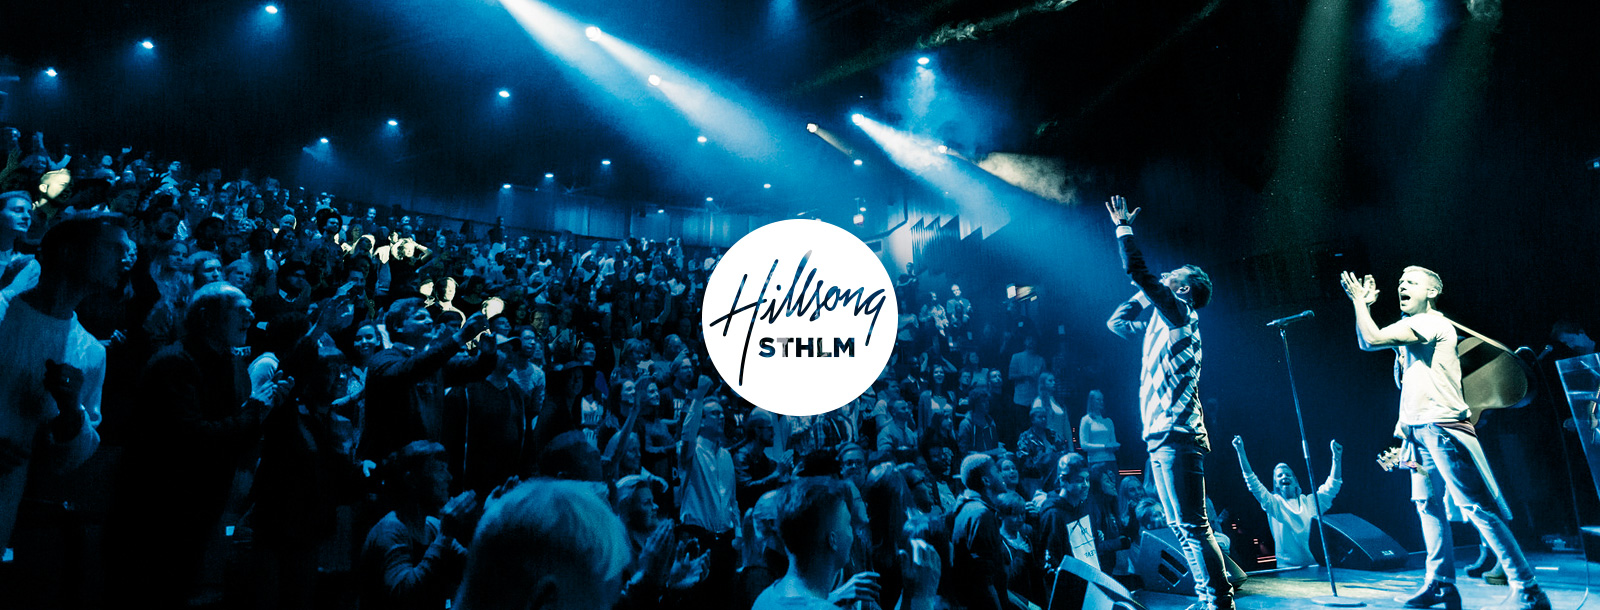 Hillsong Sweden,